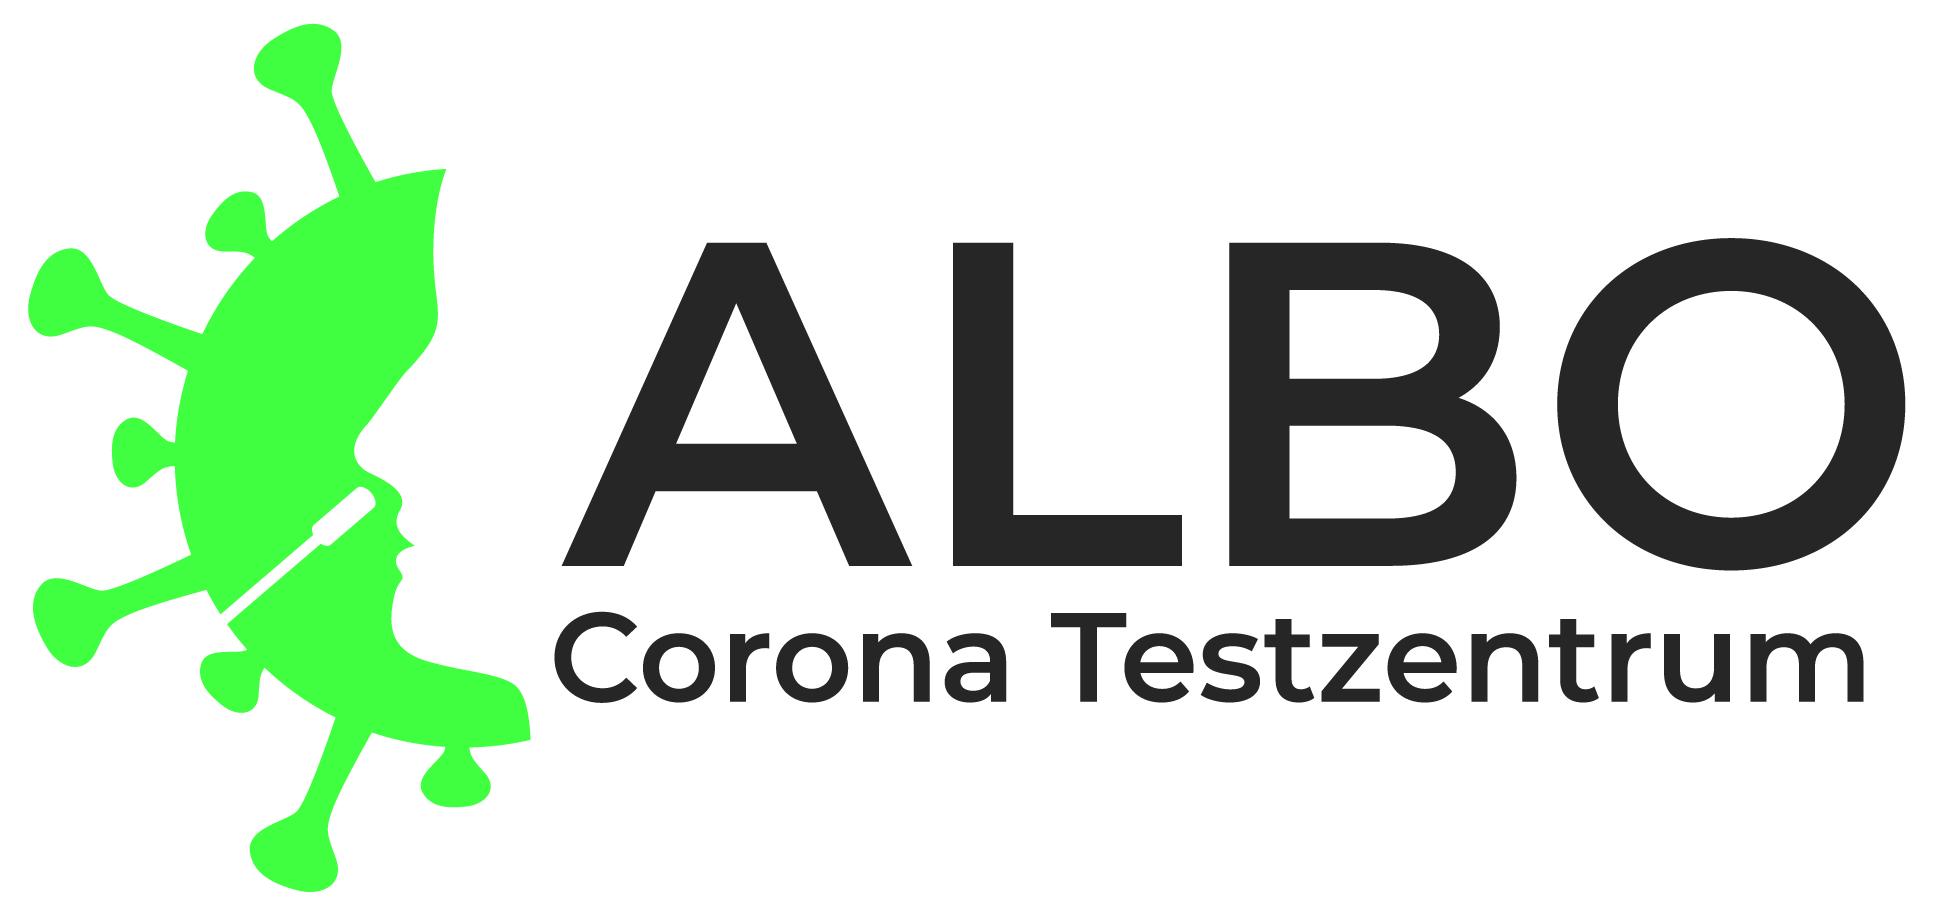 ALBO Corona Testzentrum LM6447 17082021 1